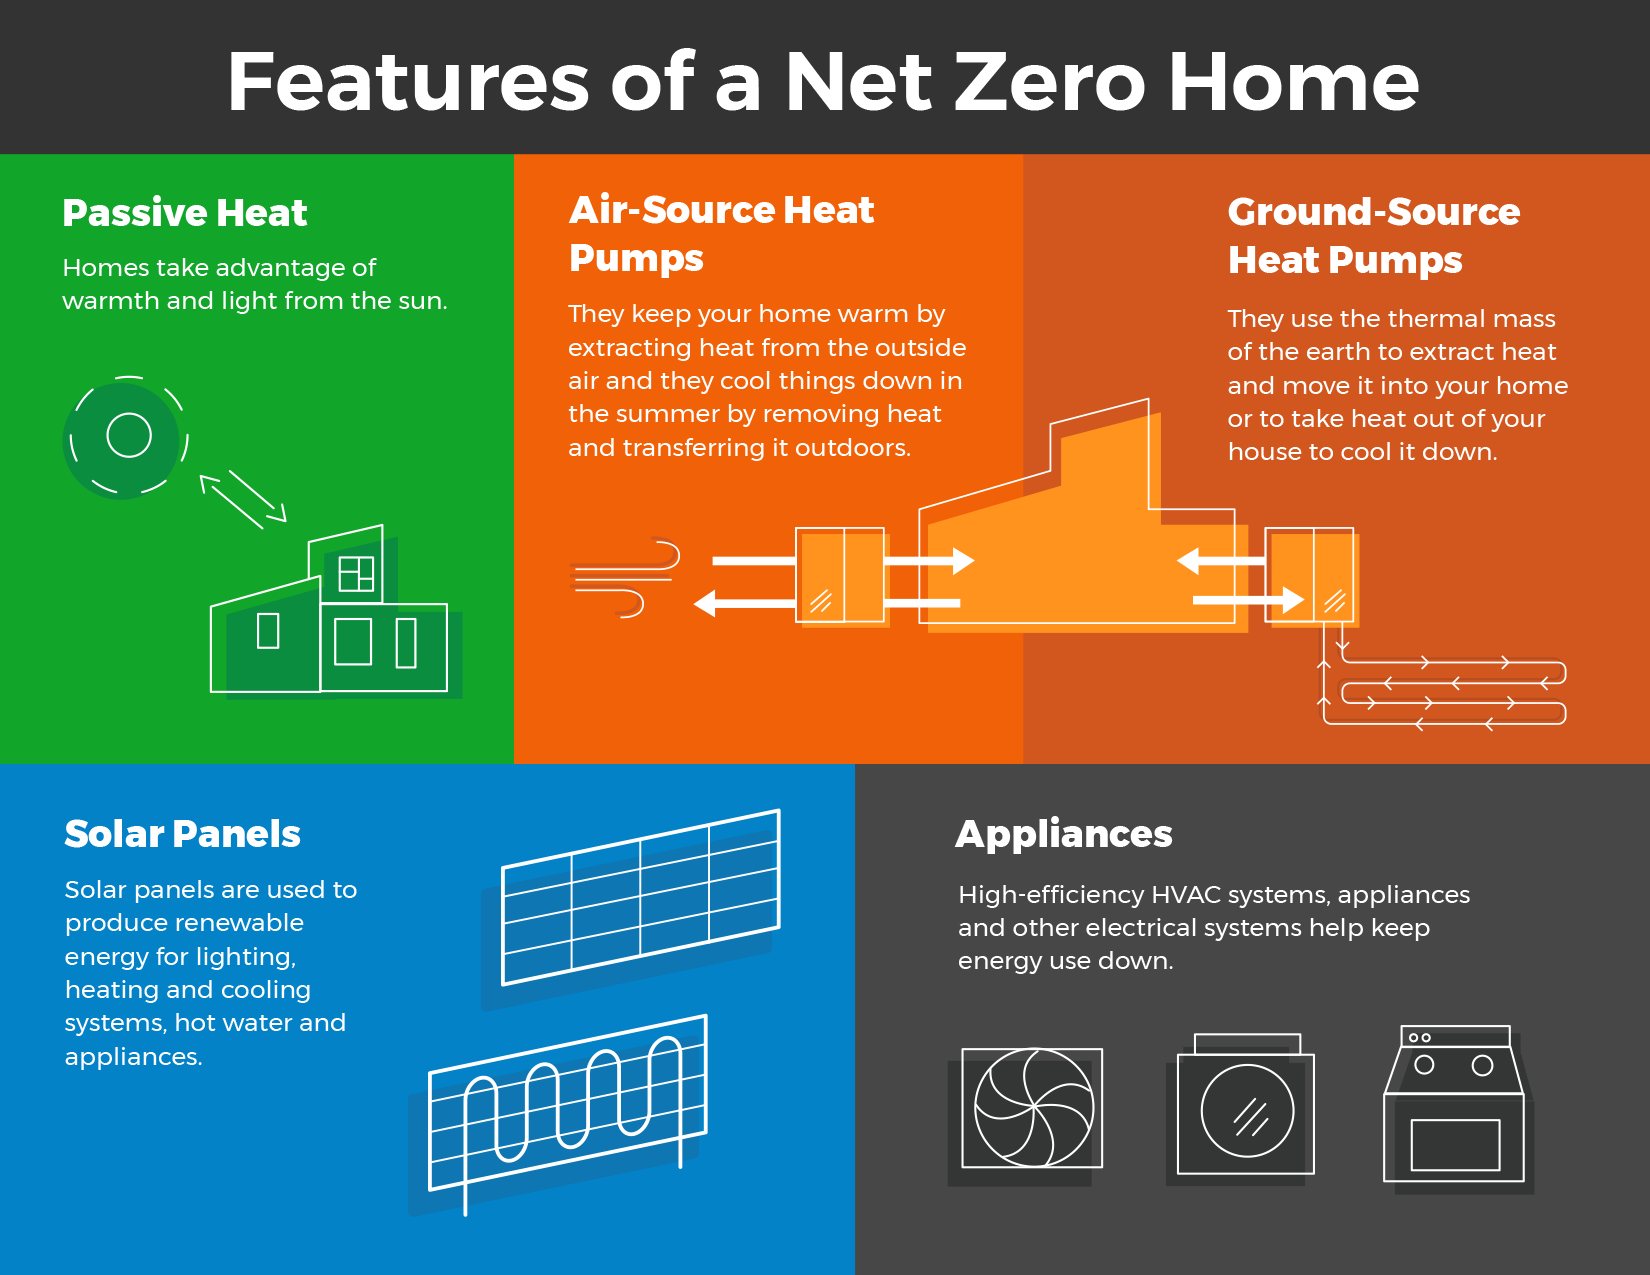 Net Zero Homes Explained Save On Energy Hvac Power Draw How Do Produce